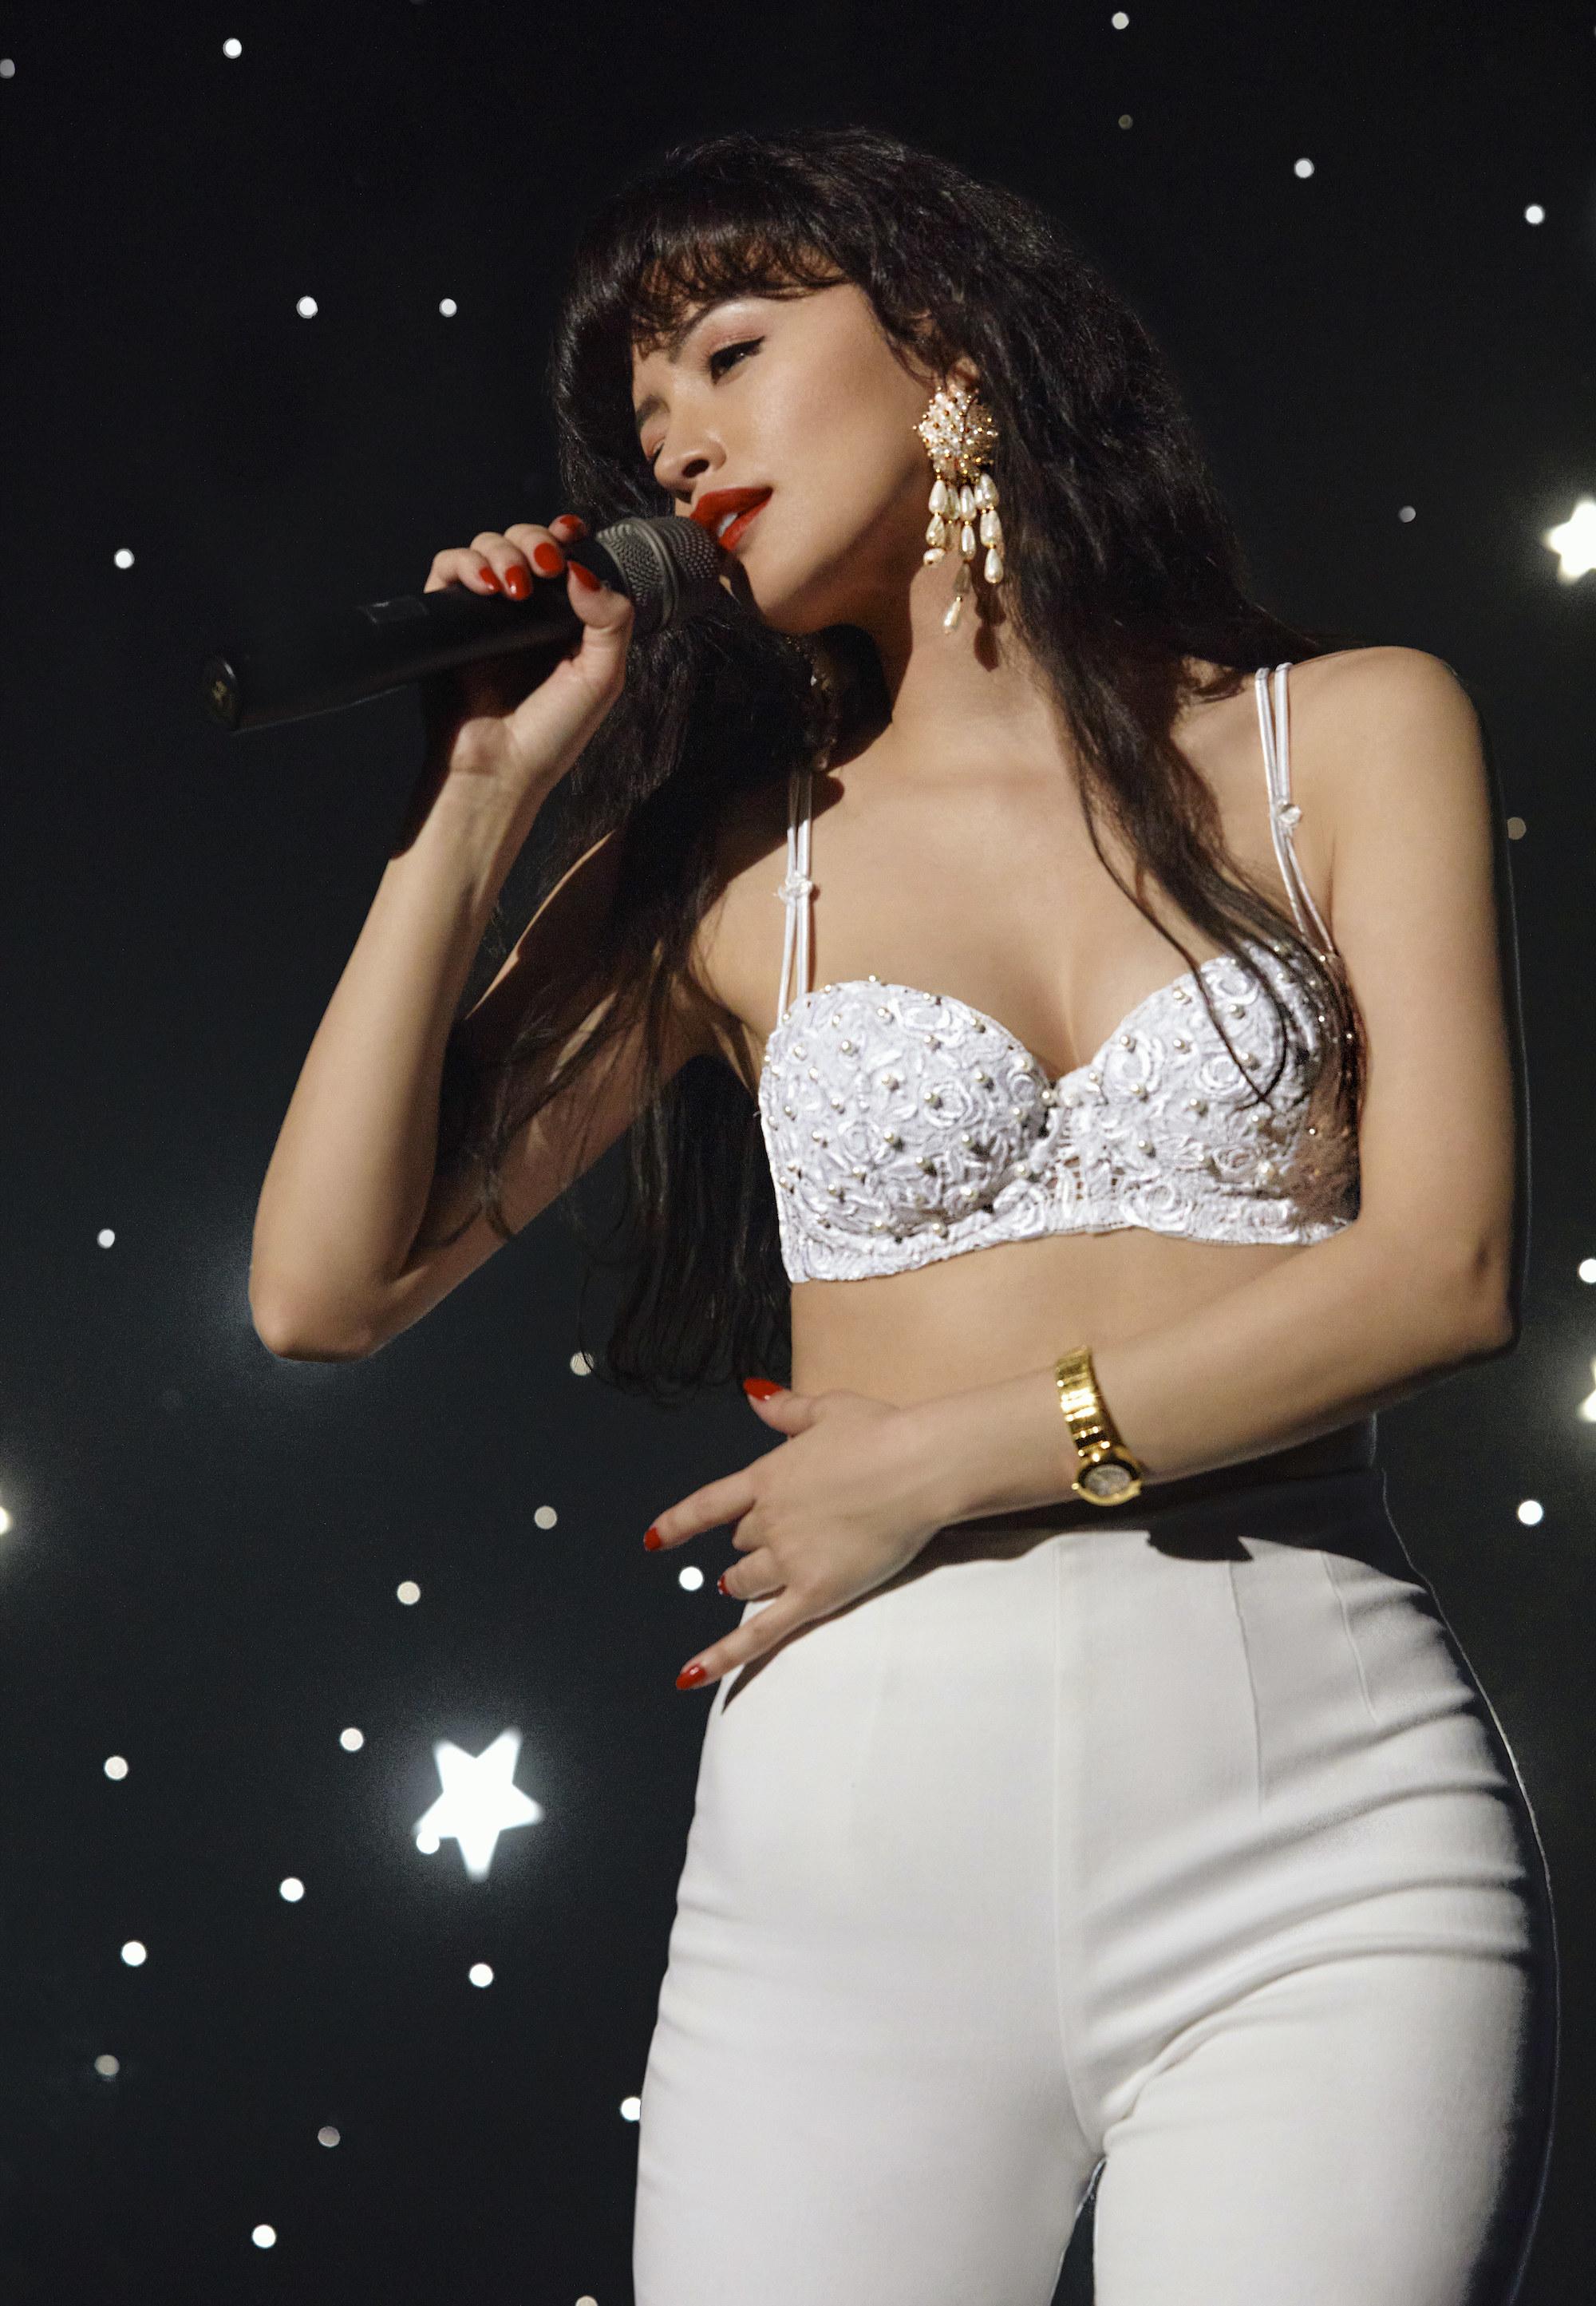 Christian Serratos as Selena singing onstage